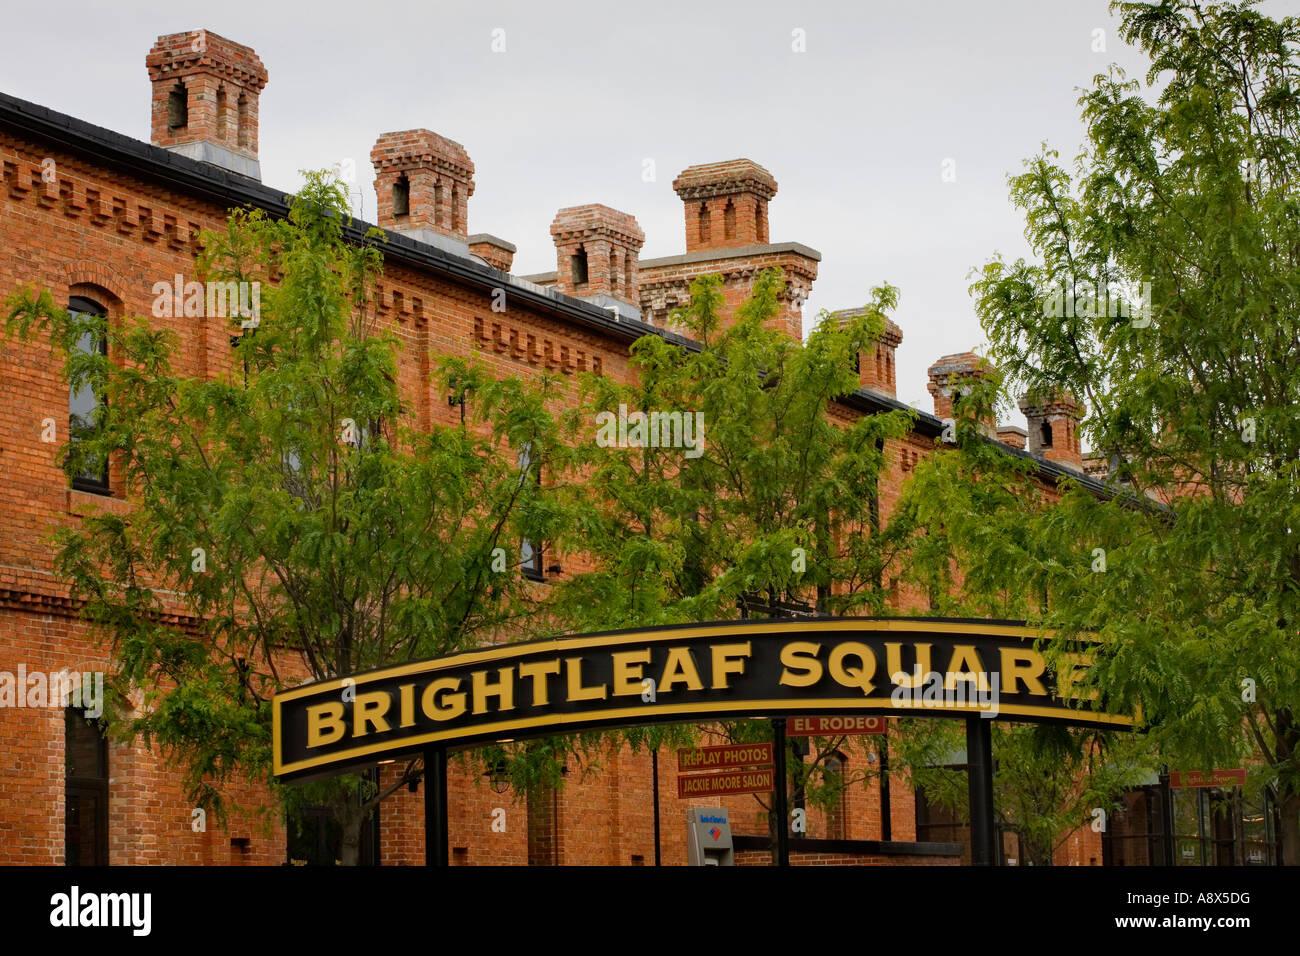 Brightleaf Square Durham North Carolina Stock Photo 12188331 Alamy